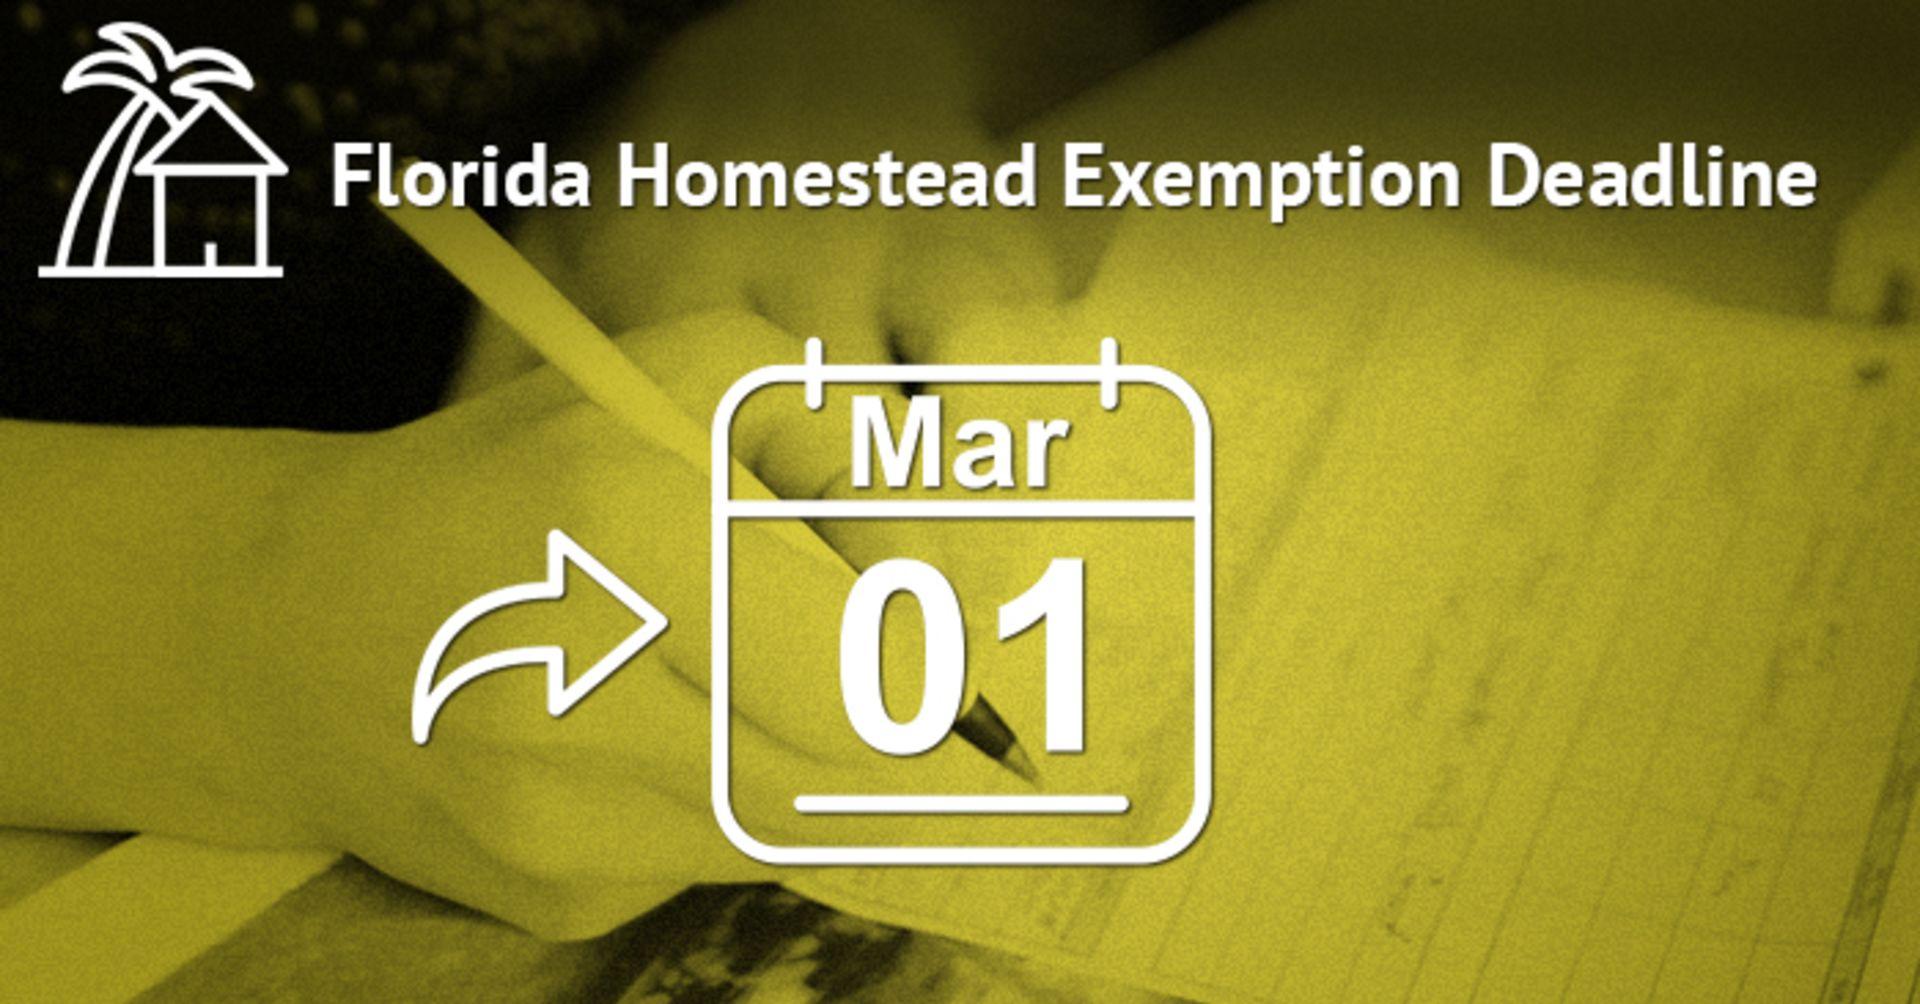 Florida Homestead Exemption 2017